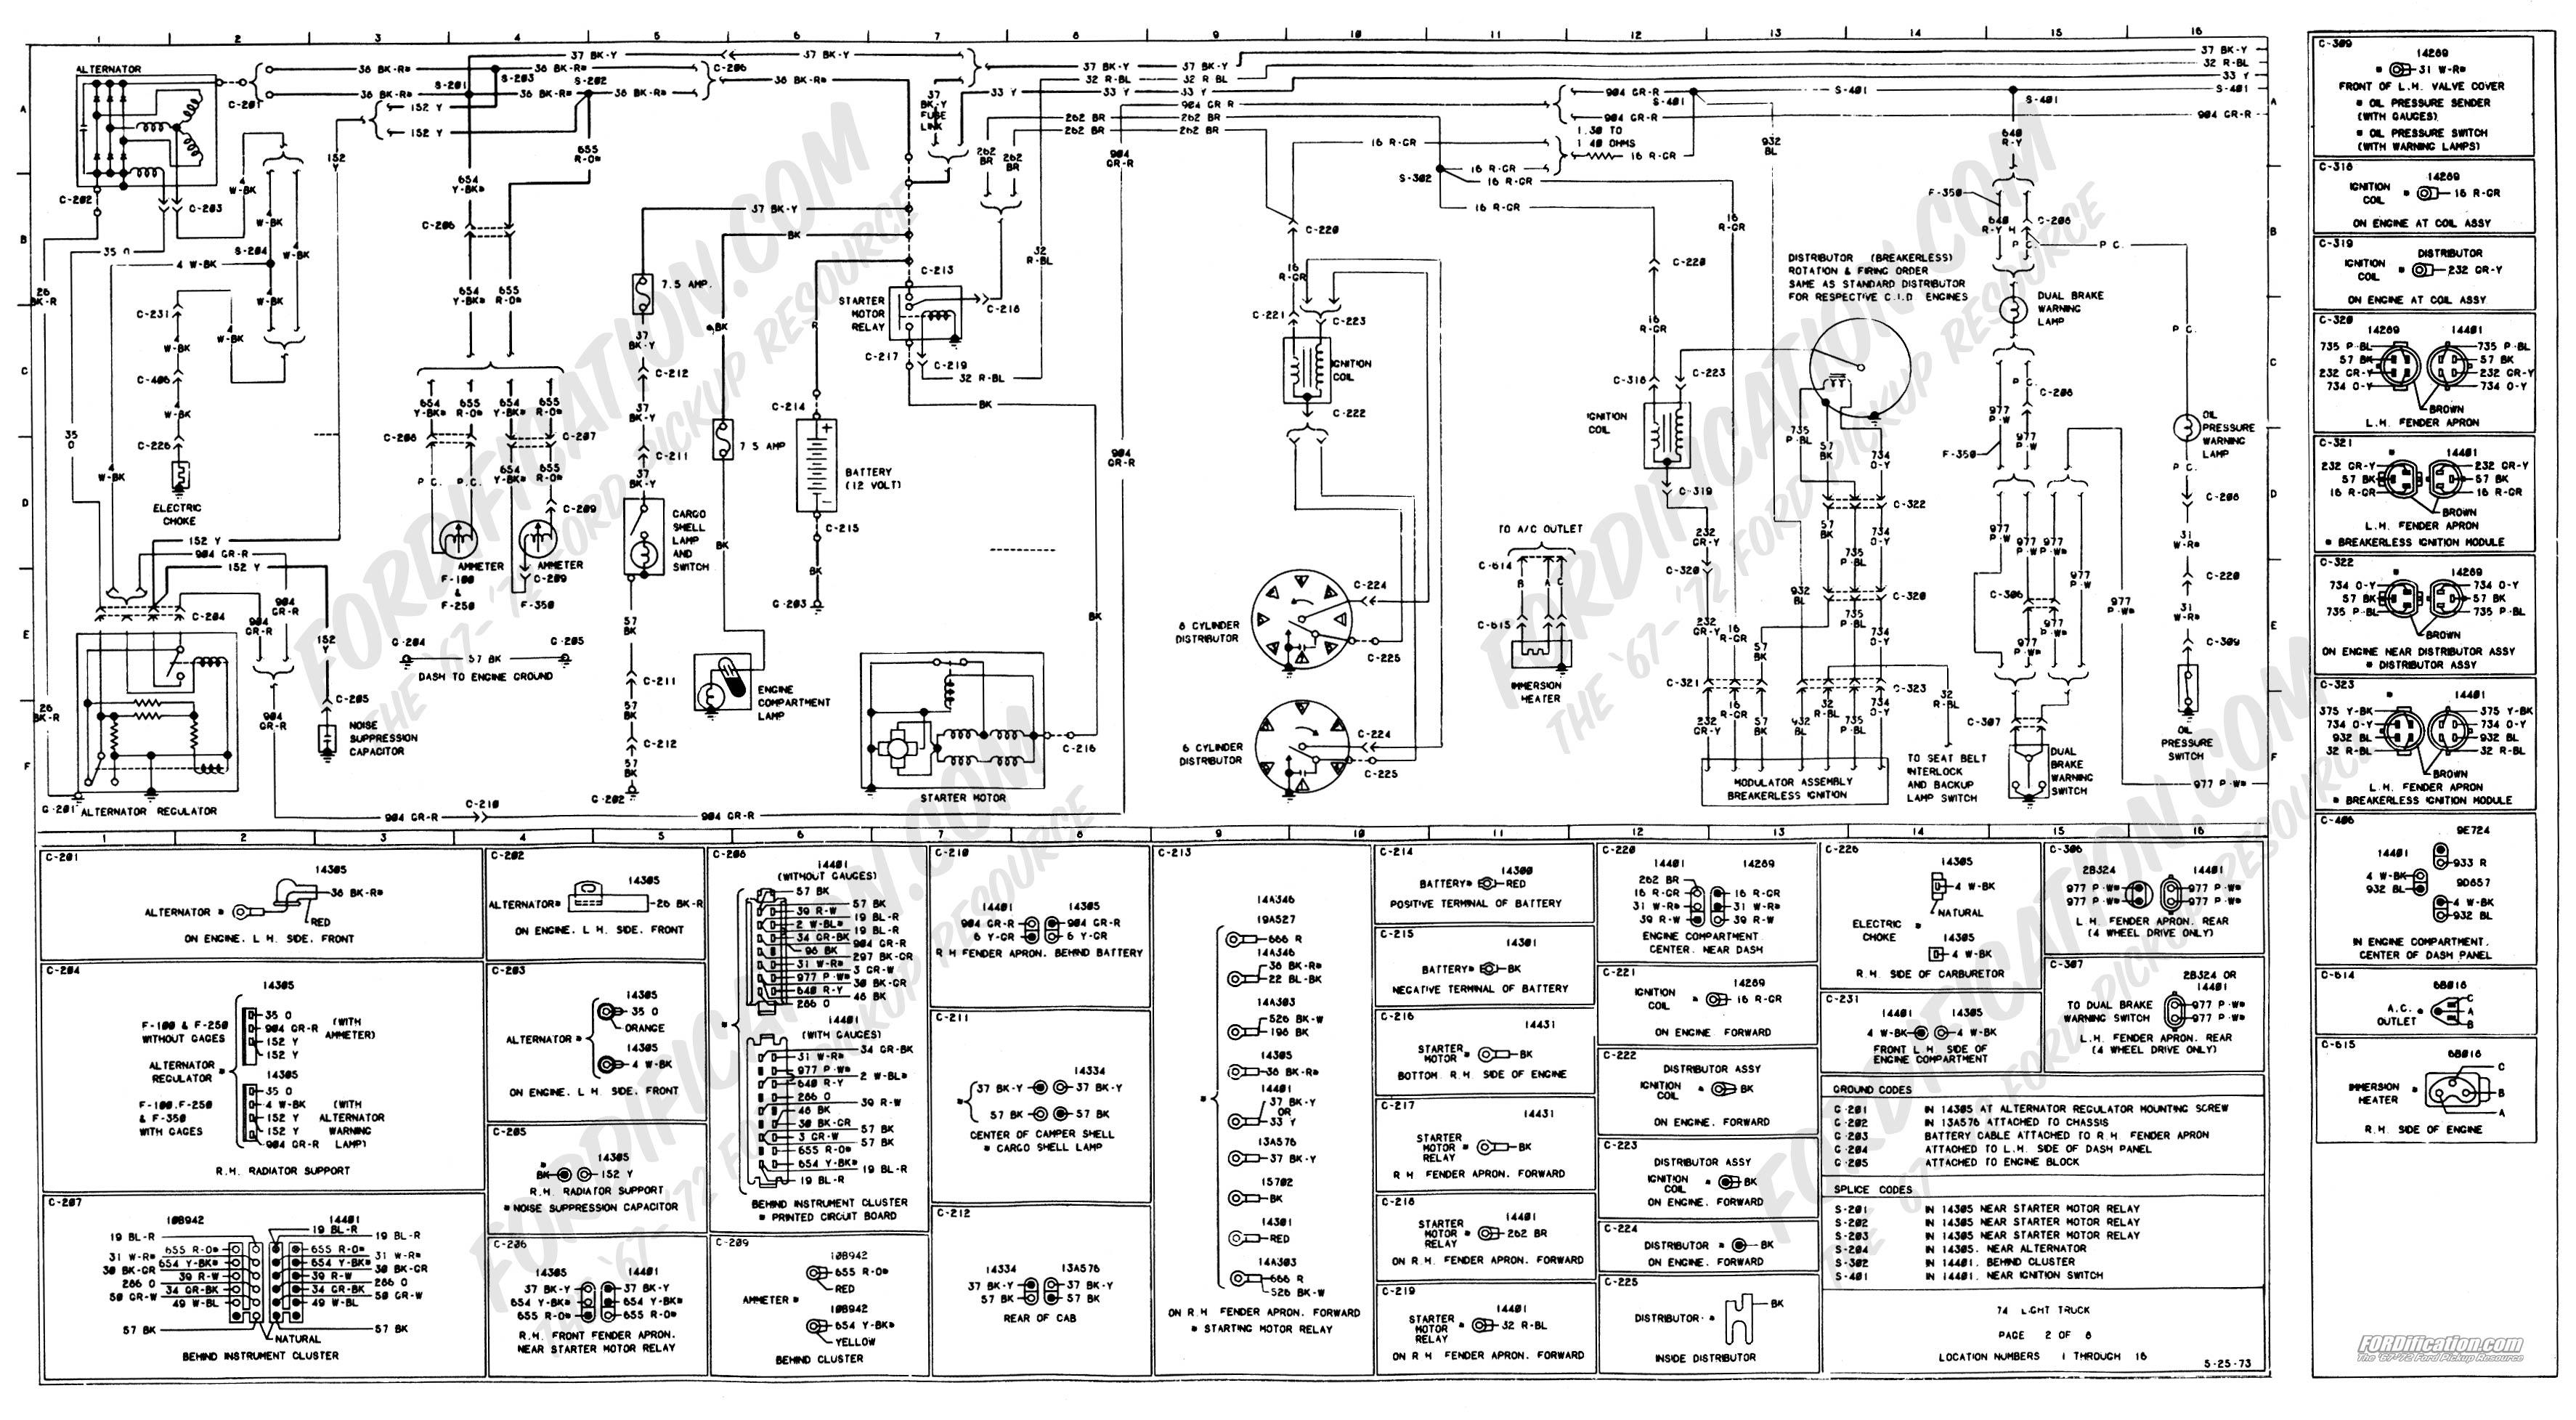 1973-1979 Ford Truck Wiring Diagrams & Schematics - Fordification - Wiring Schematic Diagram